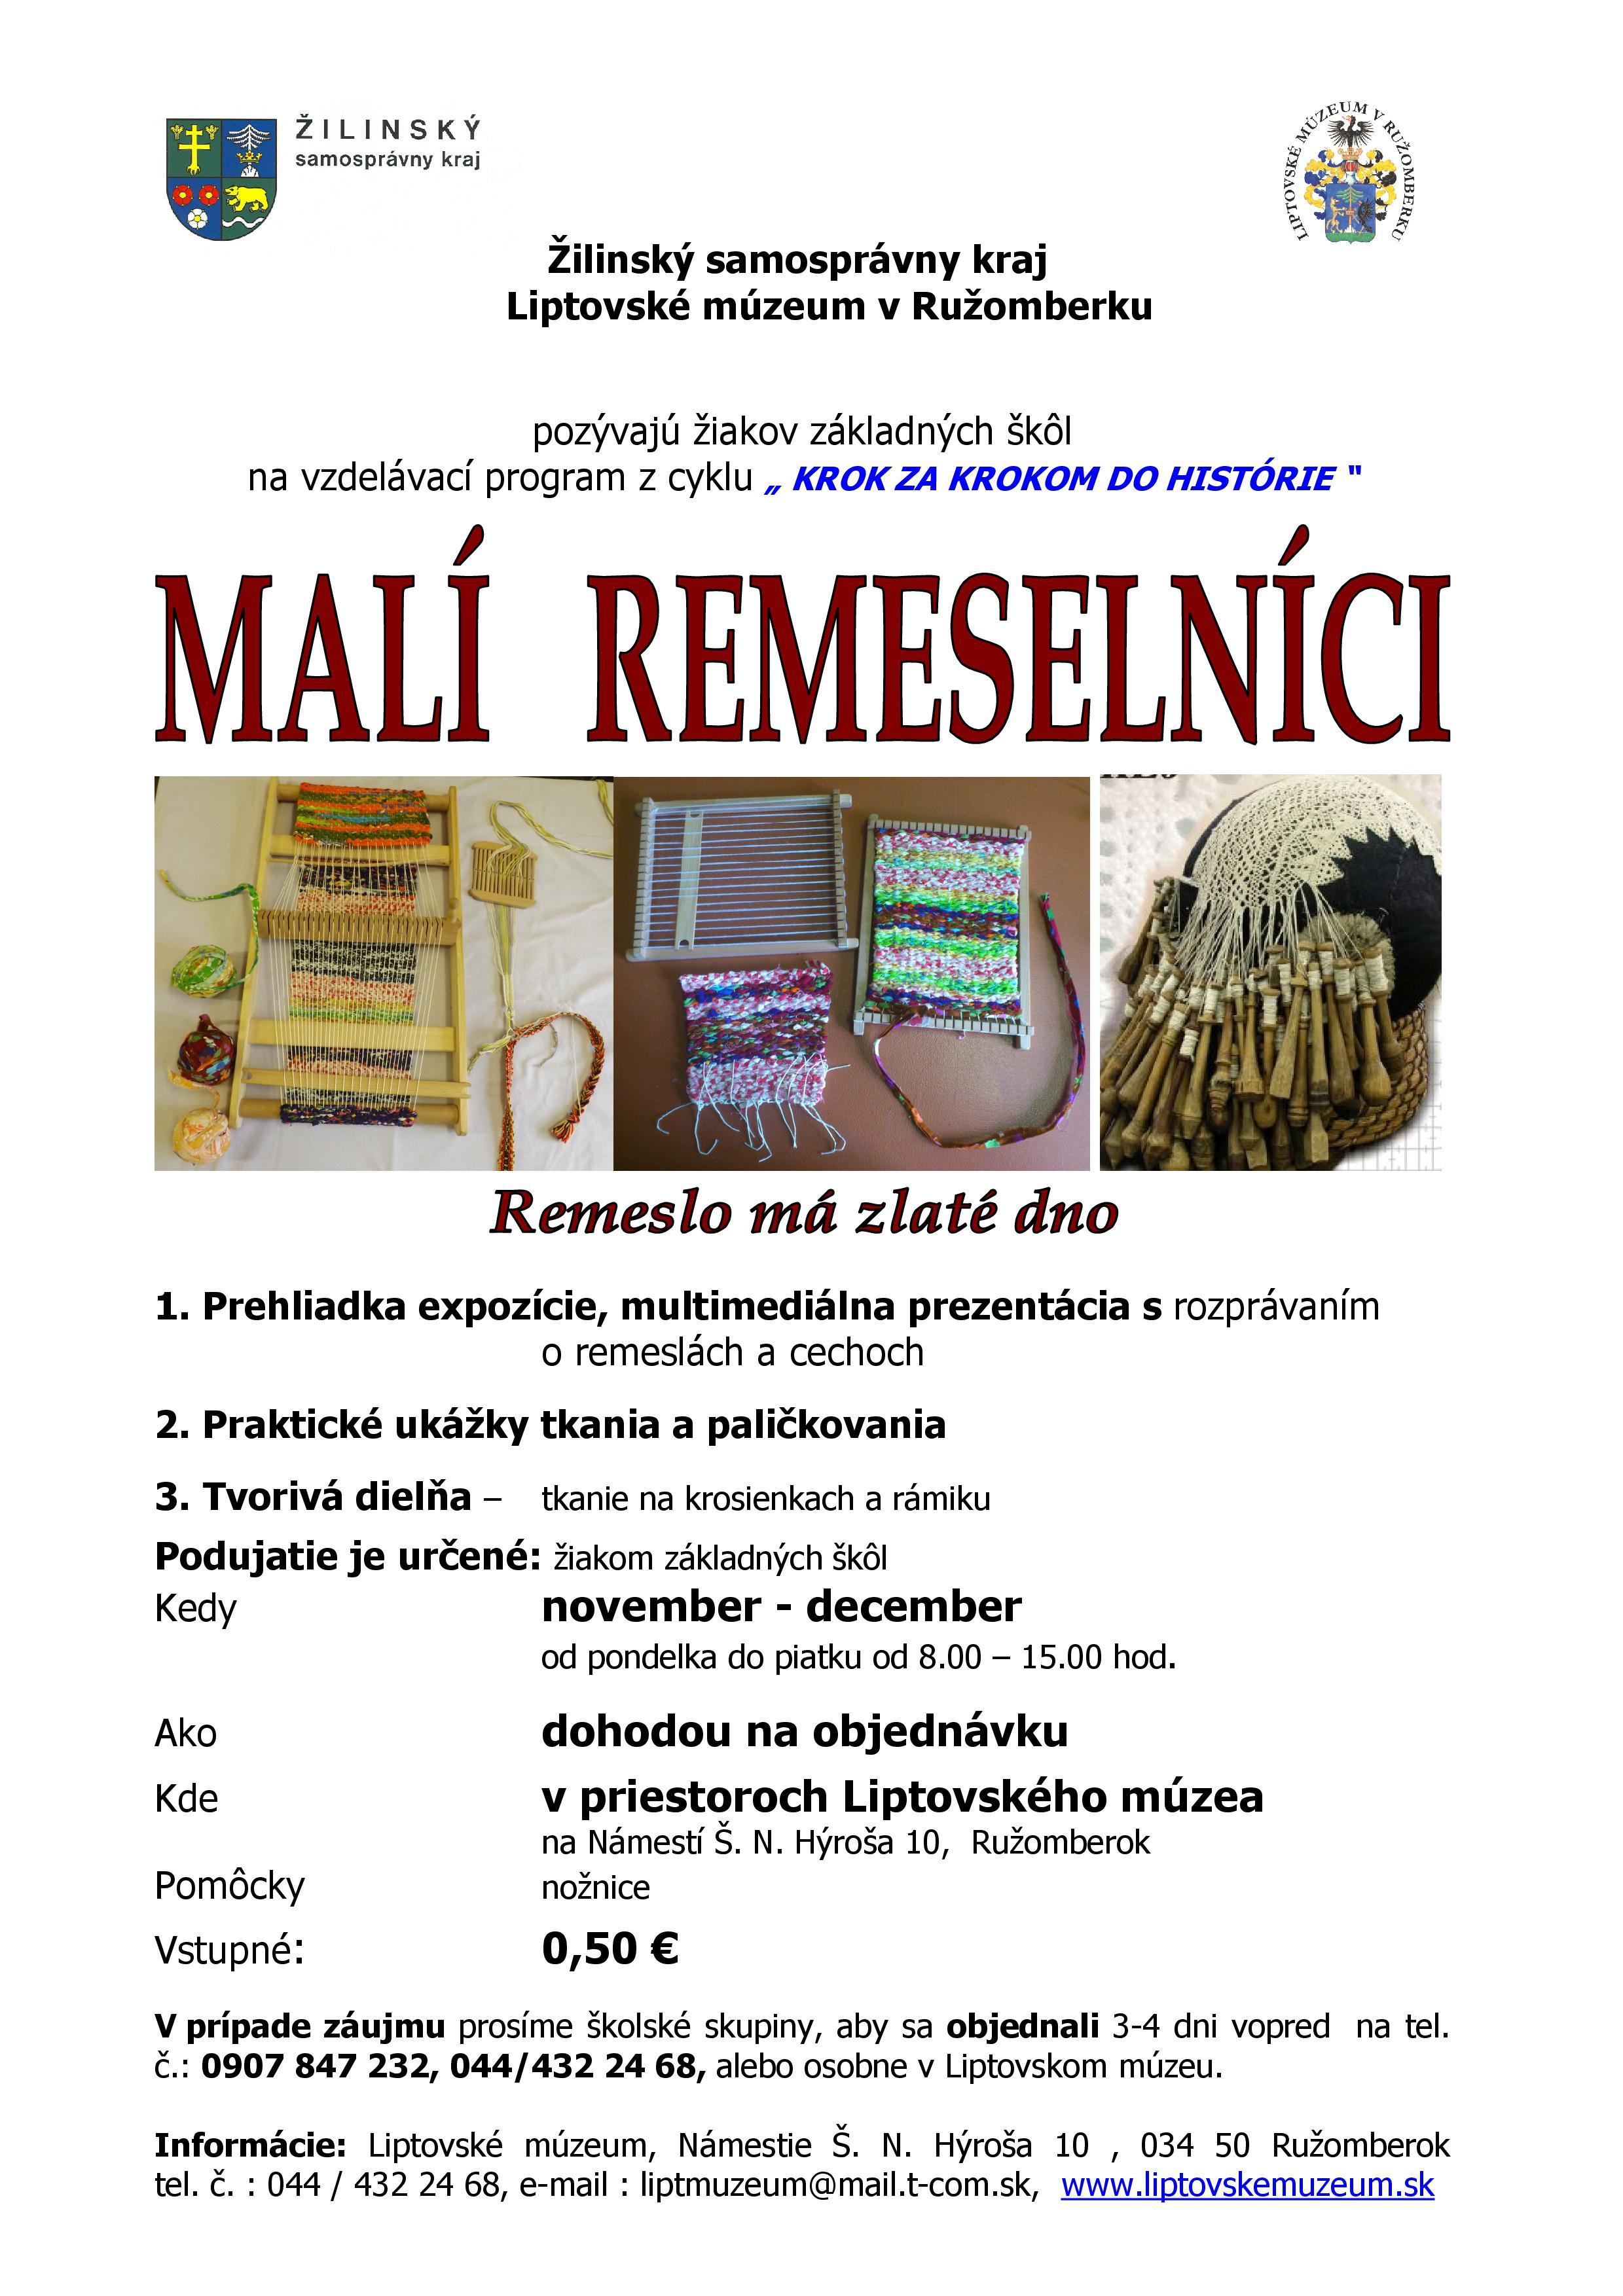 mali-remeselnici-december-2014-plagat